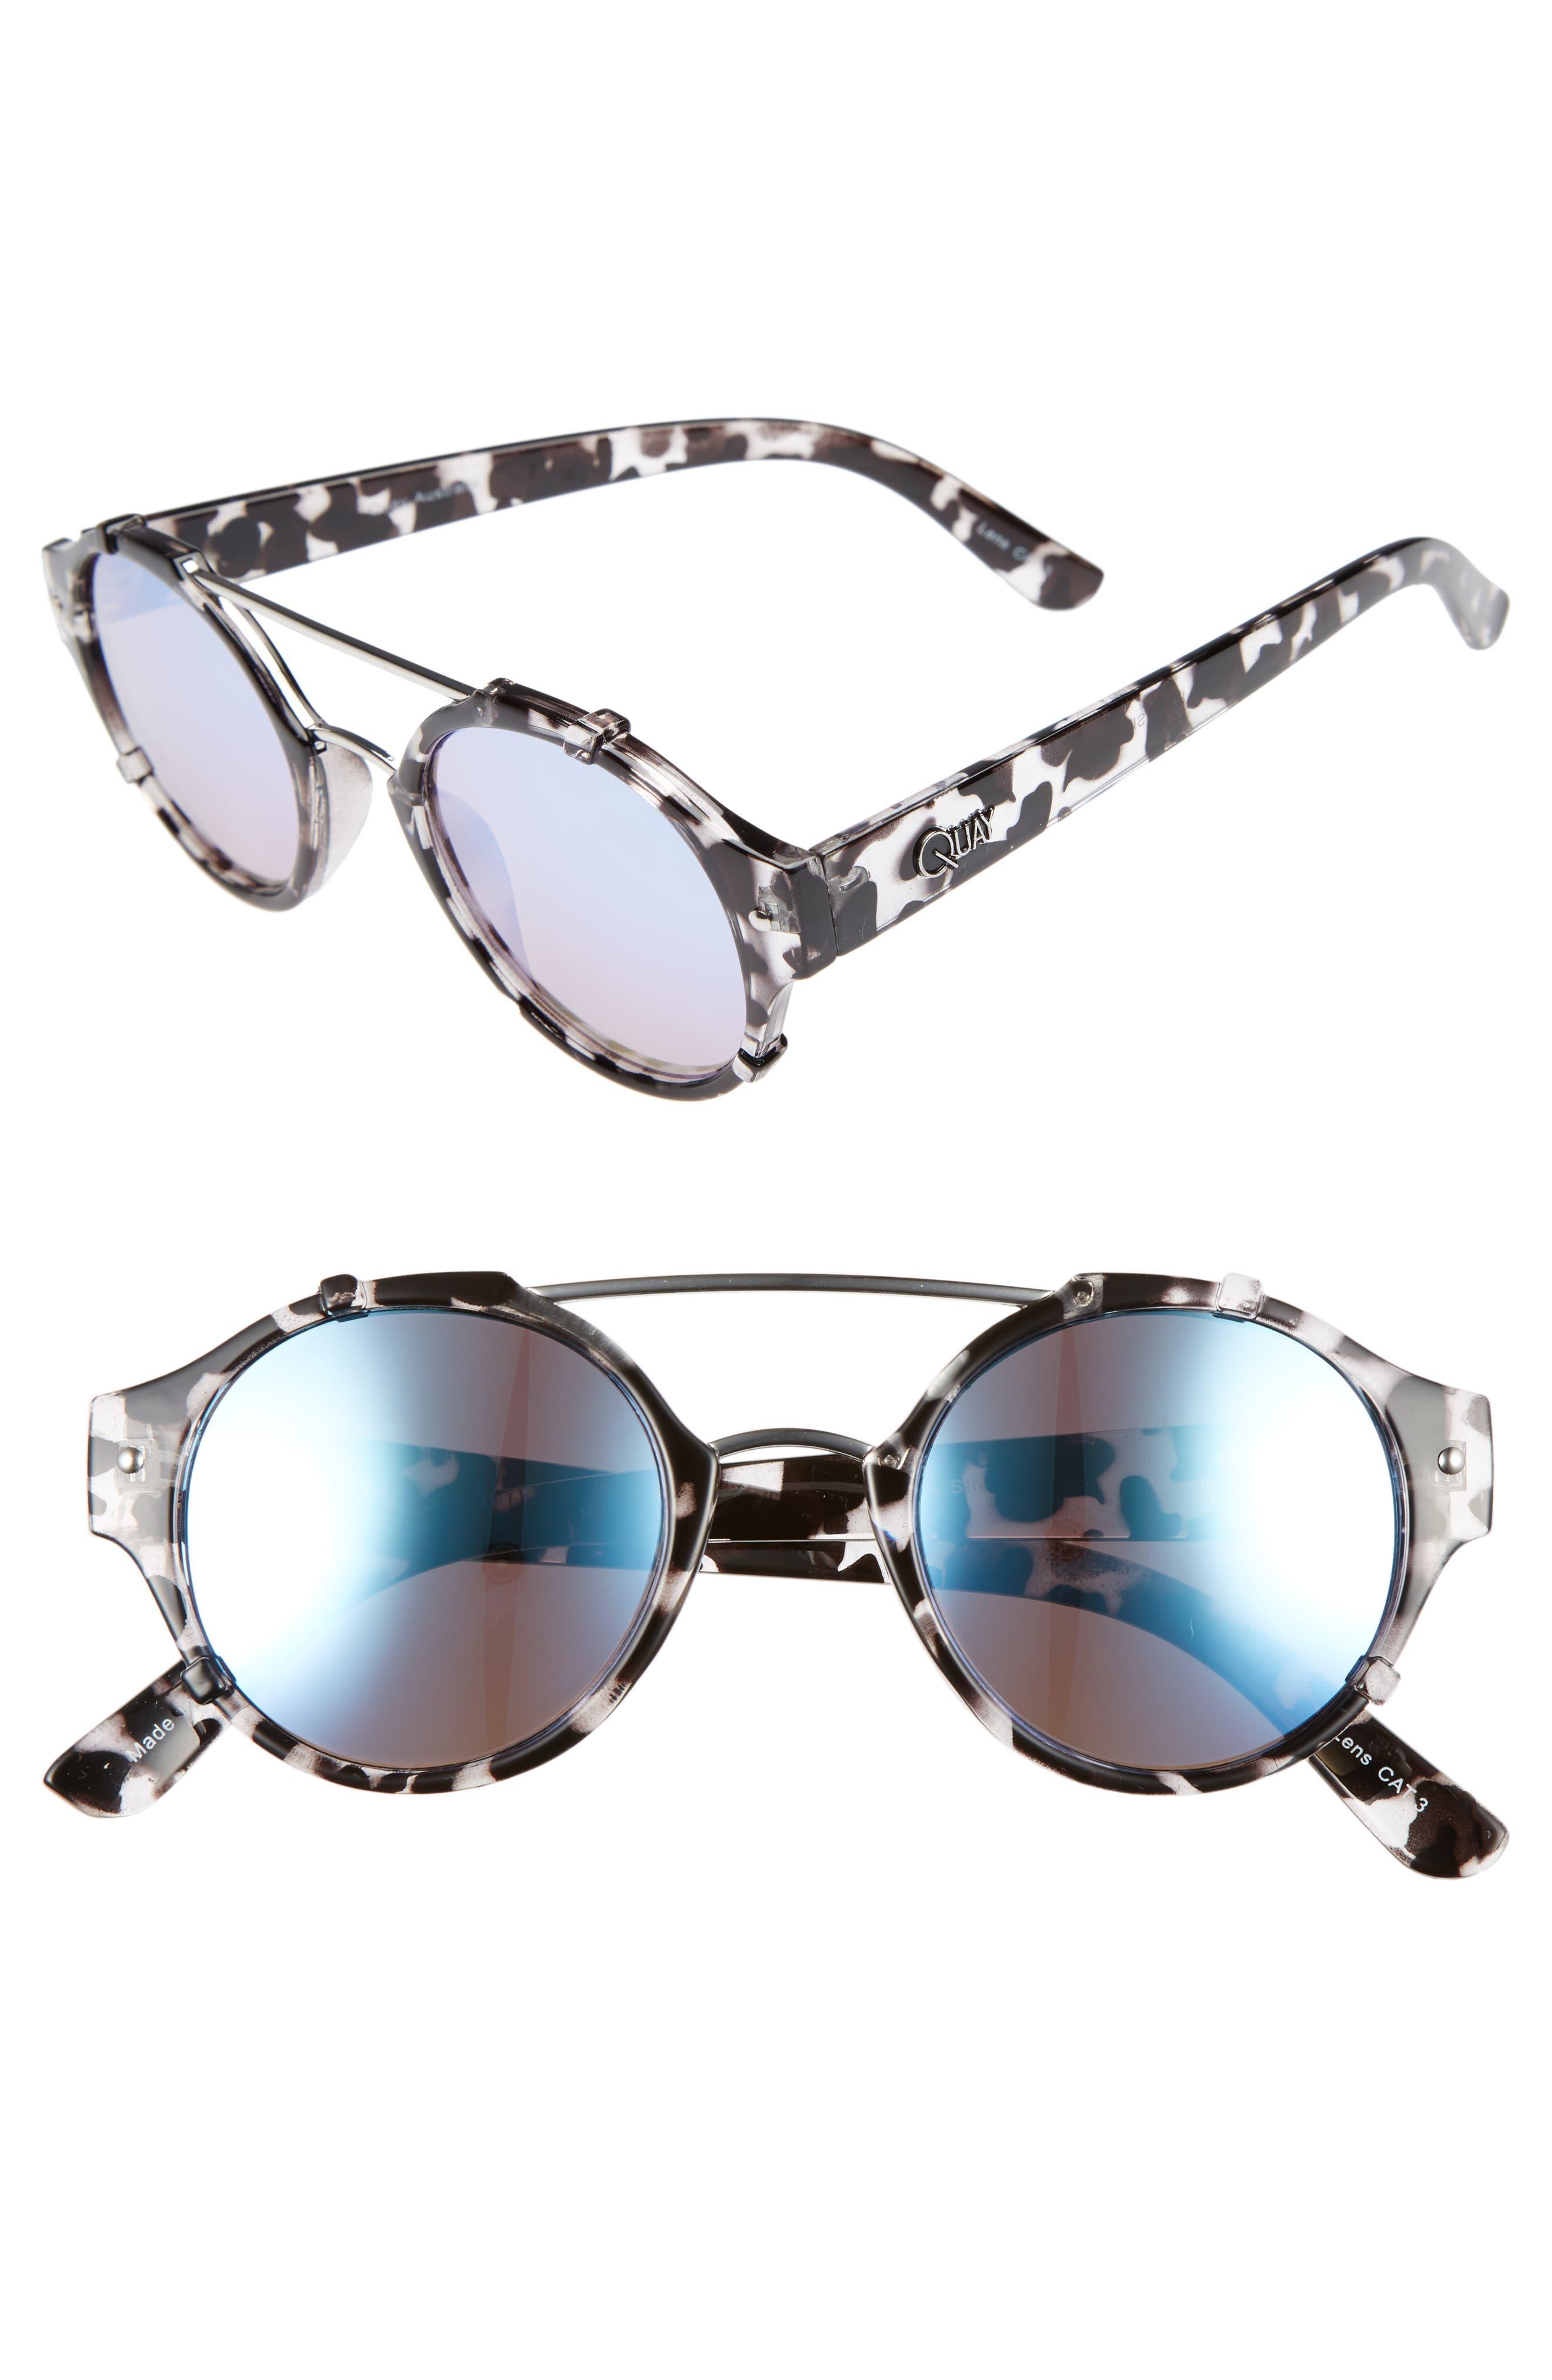 Main Image - Quay Australia It's a Sin 49mm Mirrored Round Sunglasses